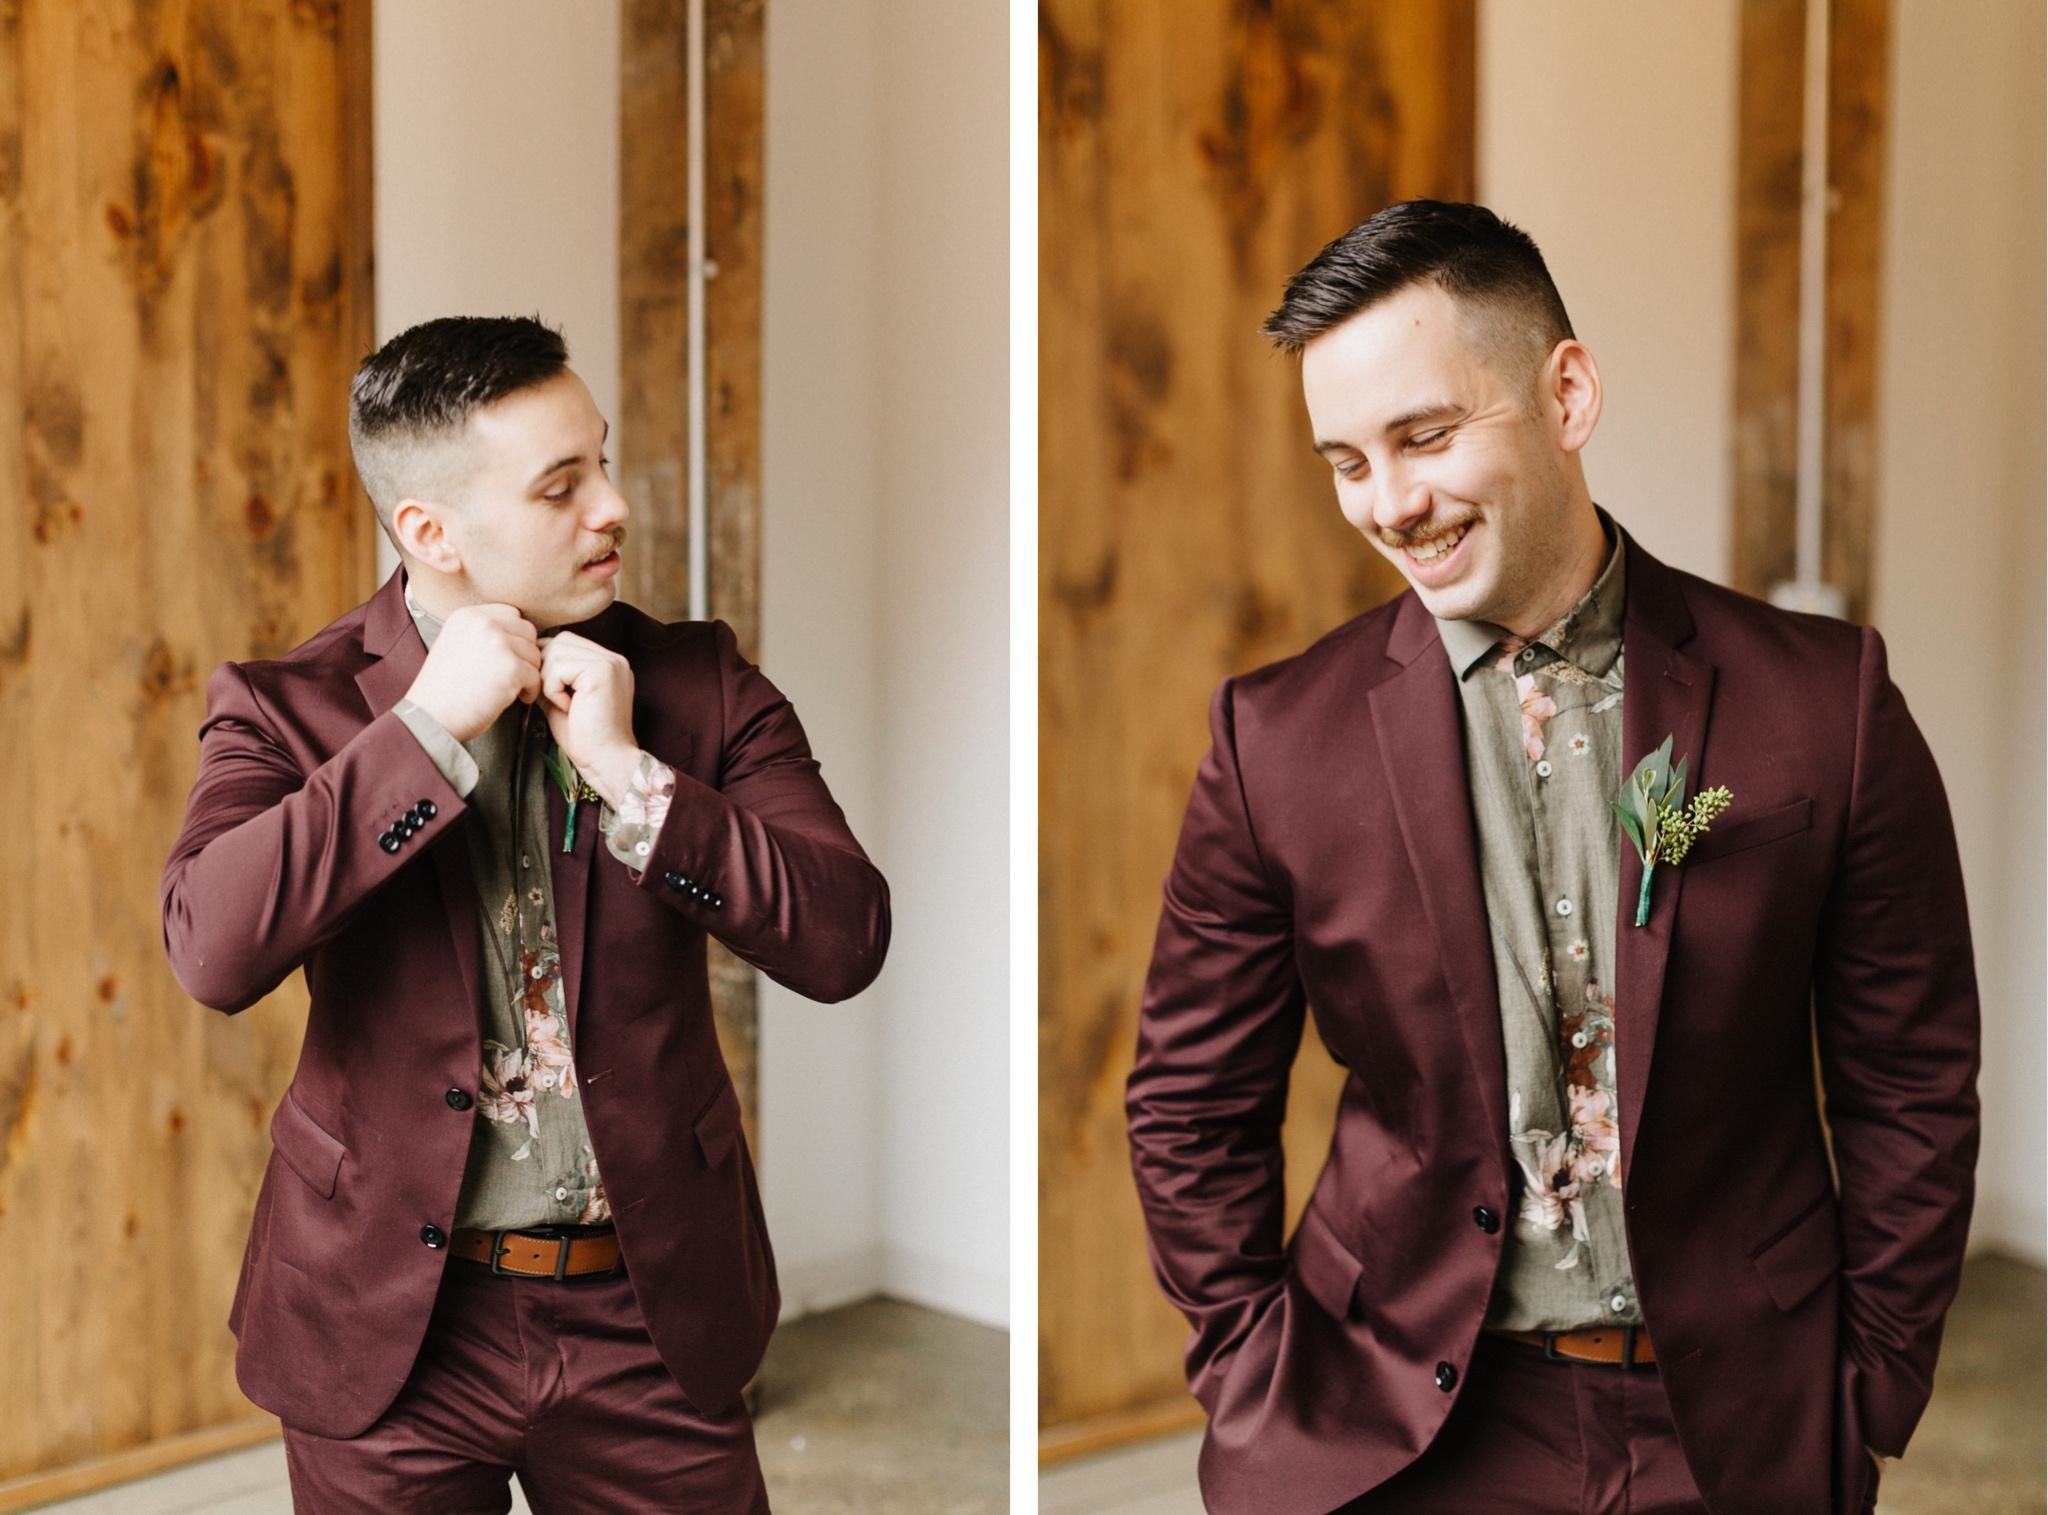 11_19-03-30 Caylen and Max Wedding Previews-23_19-03-30 Caylen and Max Wedding Previews-22.jpg